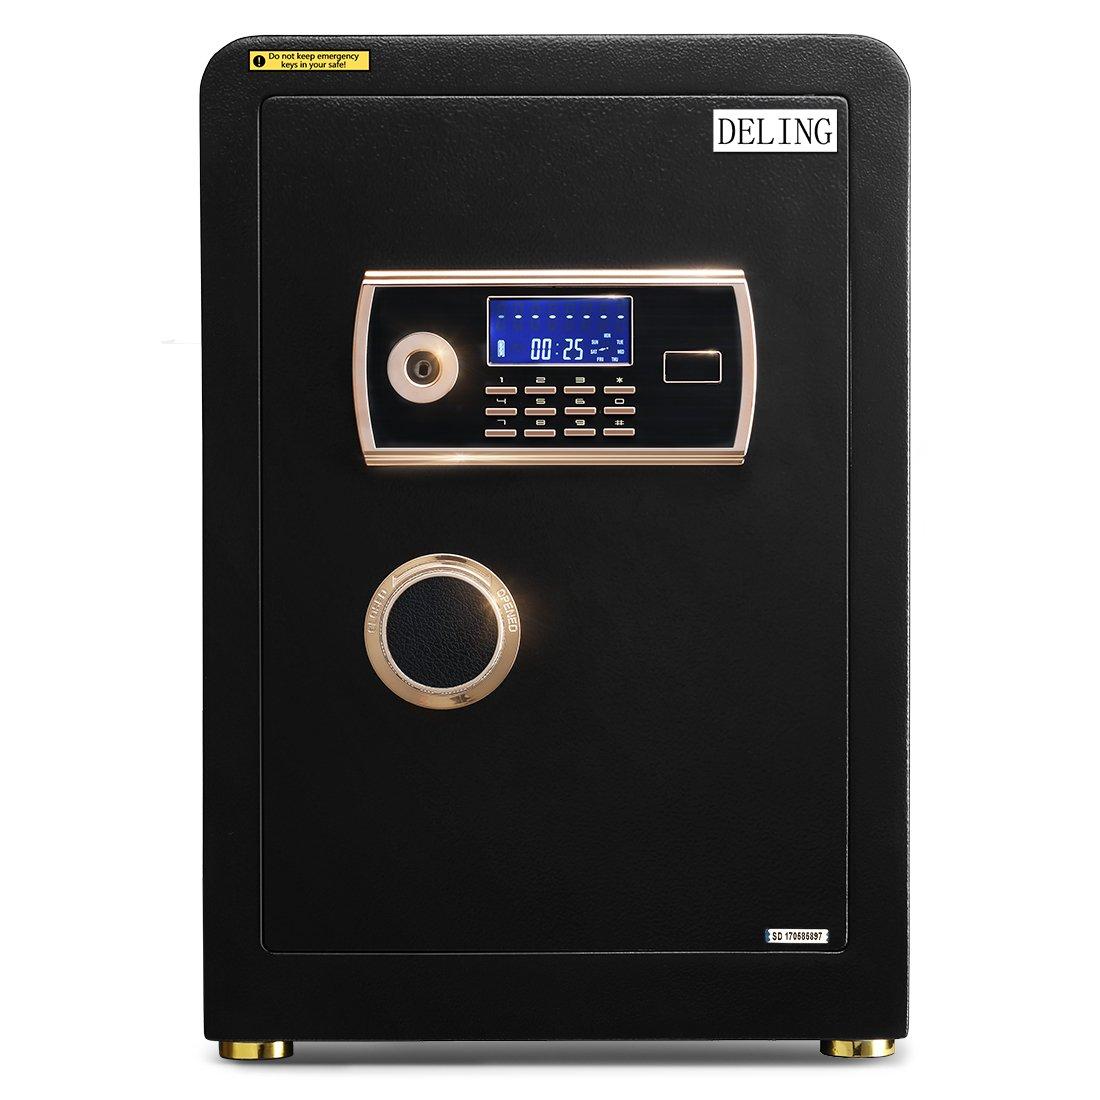 Doitpower 22 Inch 2.0 Cubic Feet Digital Electronic Safe Black Box Password Lock Home Office Use